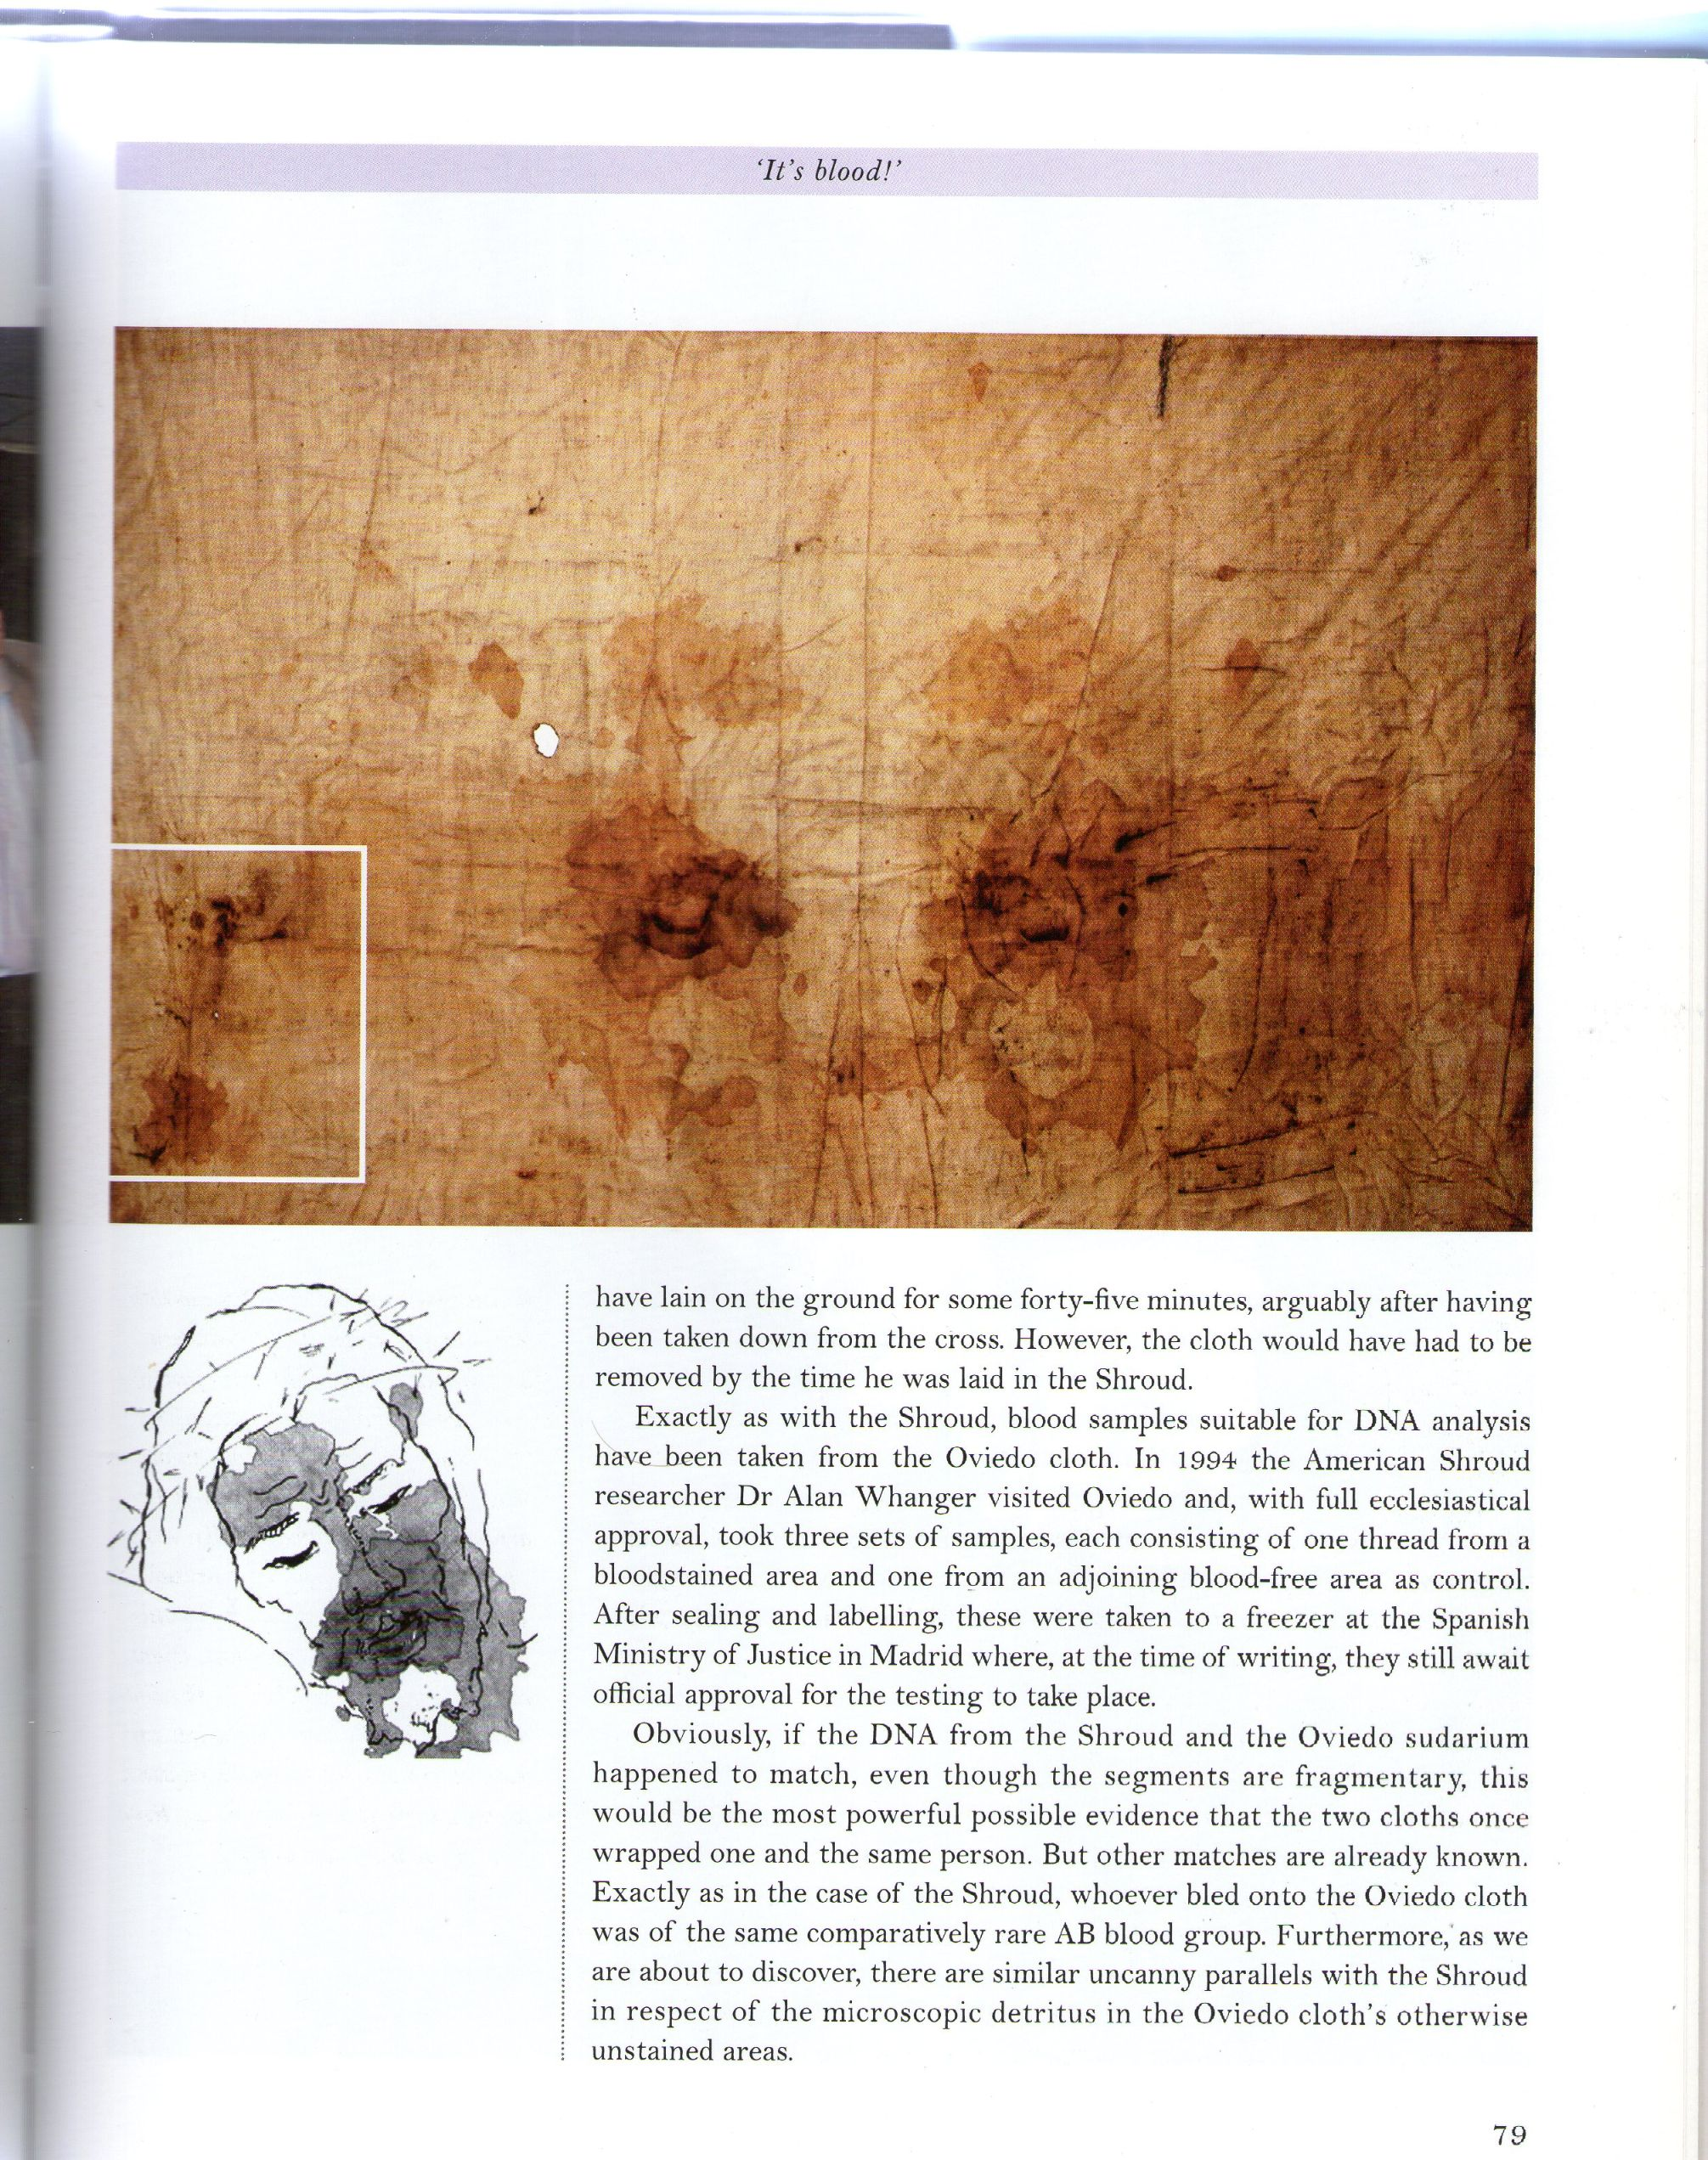 Photo 2. Sudario face image